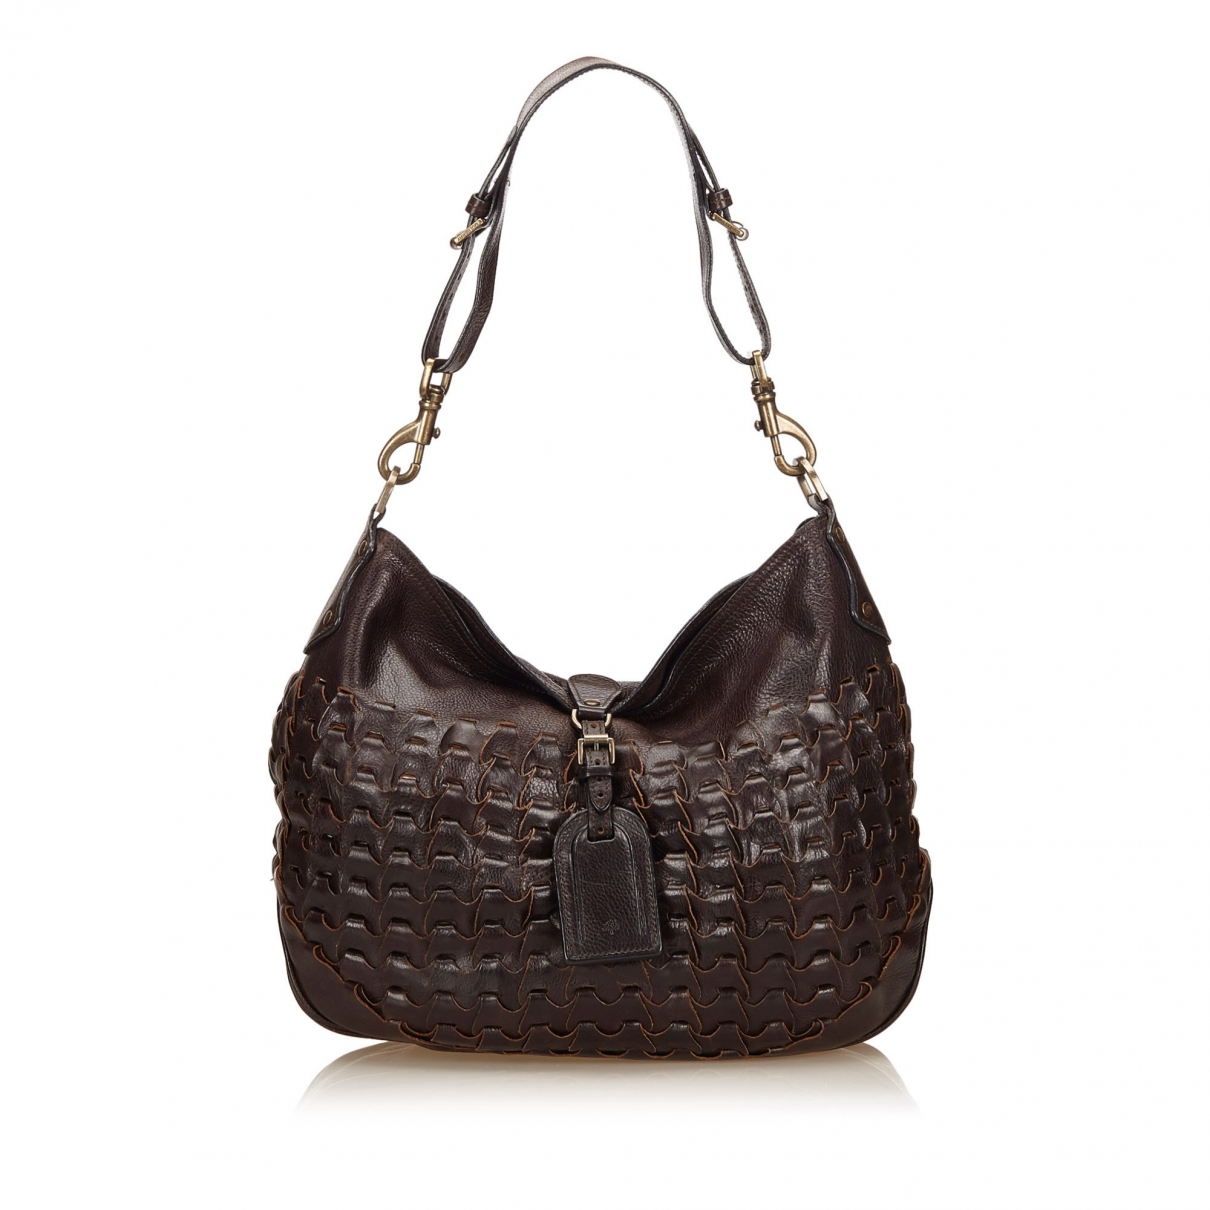 Mulberry N Brown Leather handbag for Women N